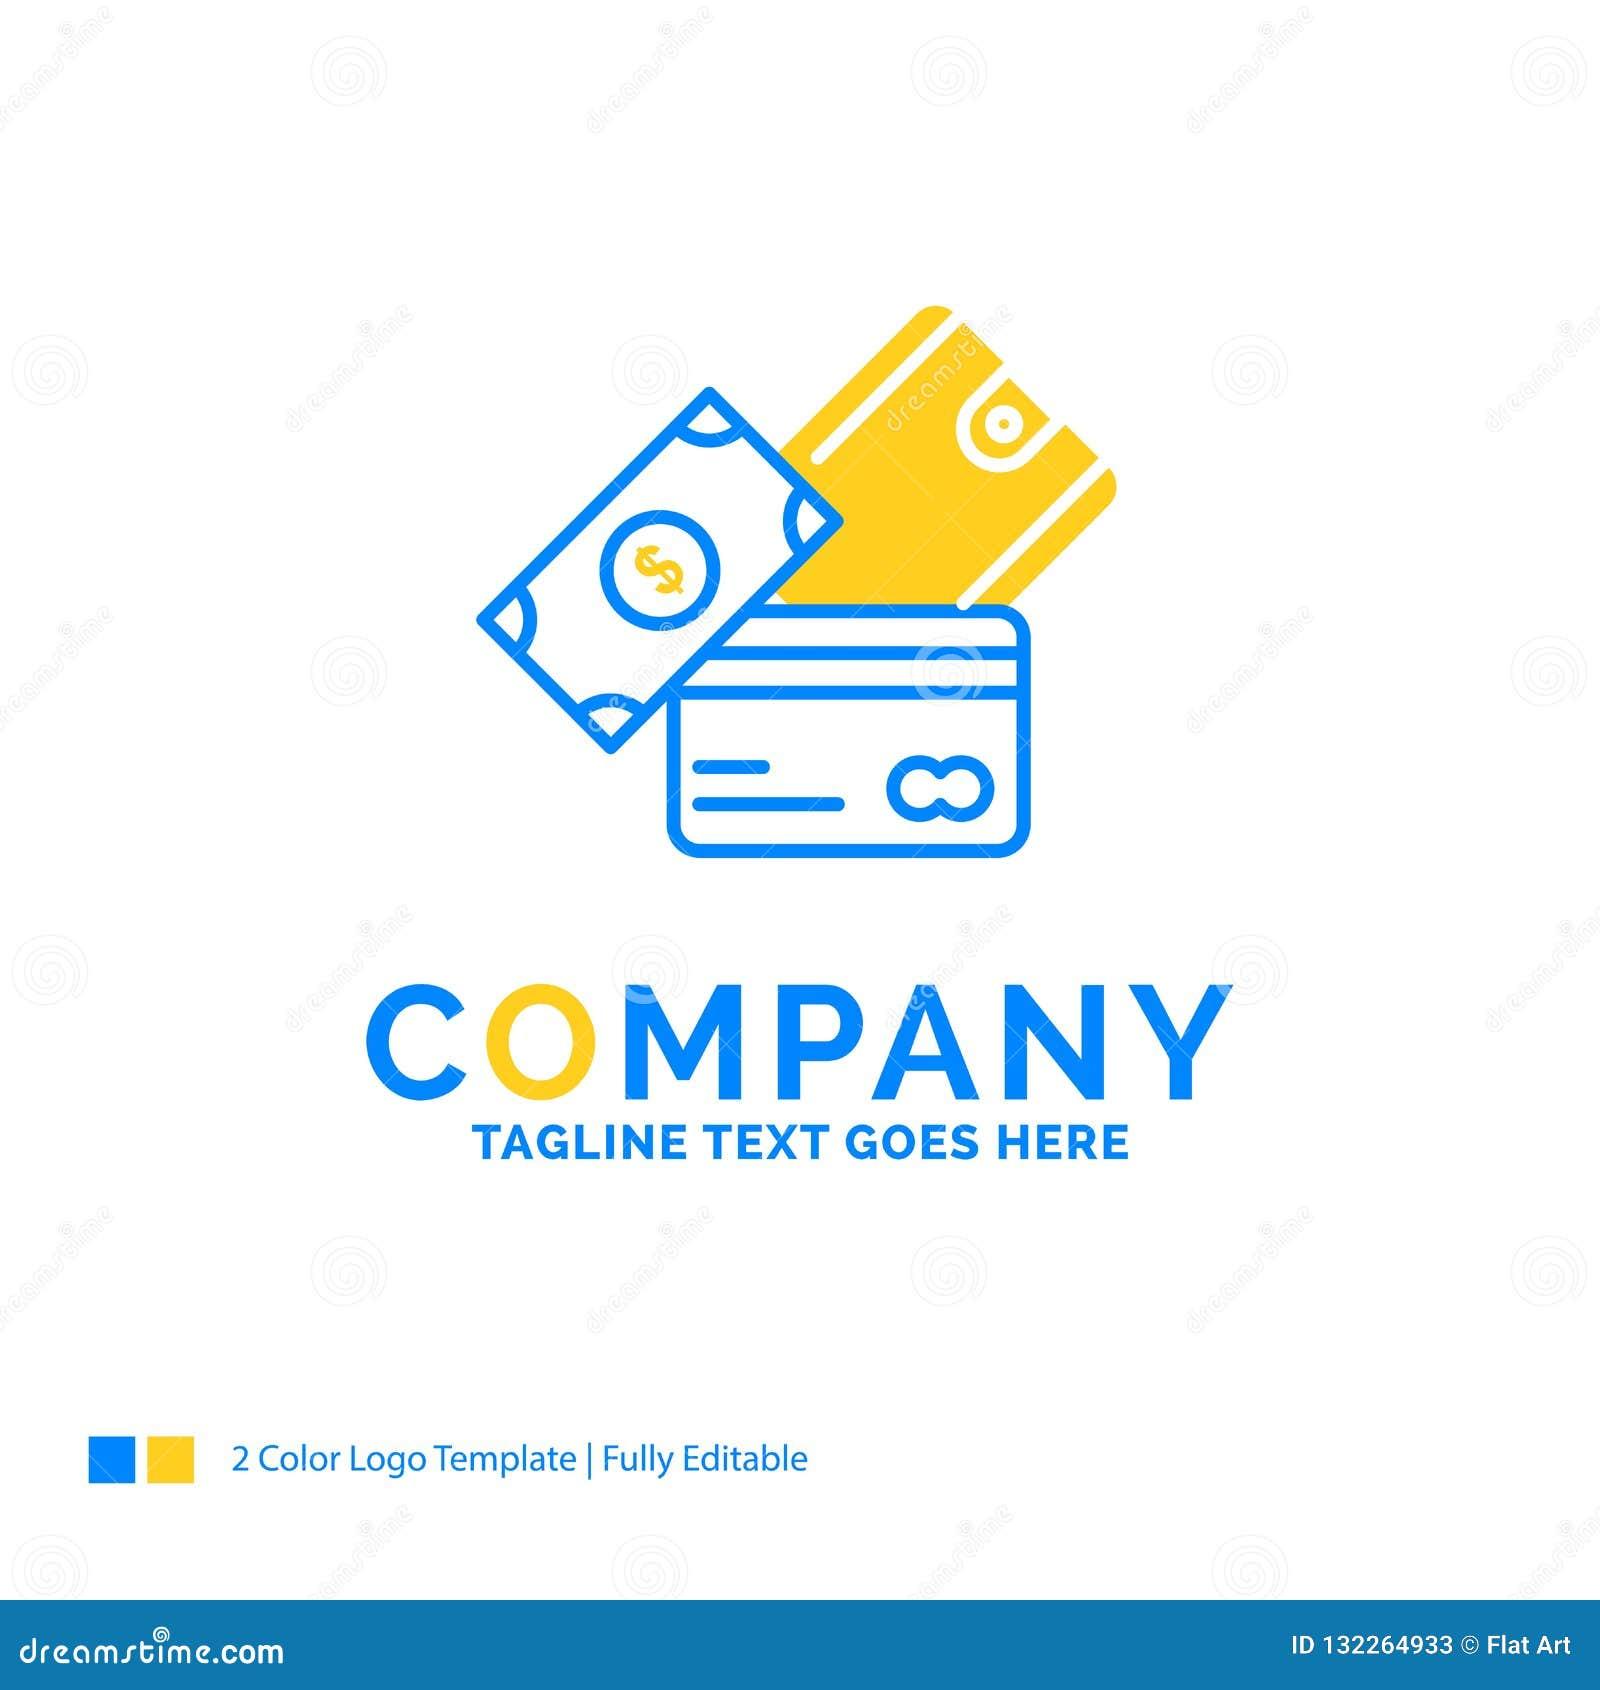 кредитная карточка, деньги, валюта, доллар, дело бумажника голубое желтое